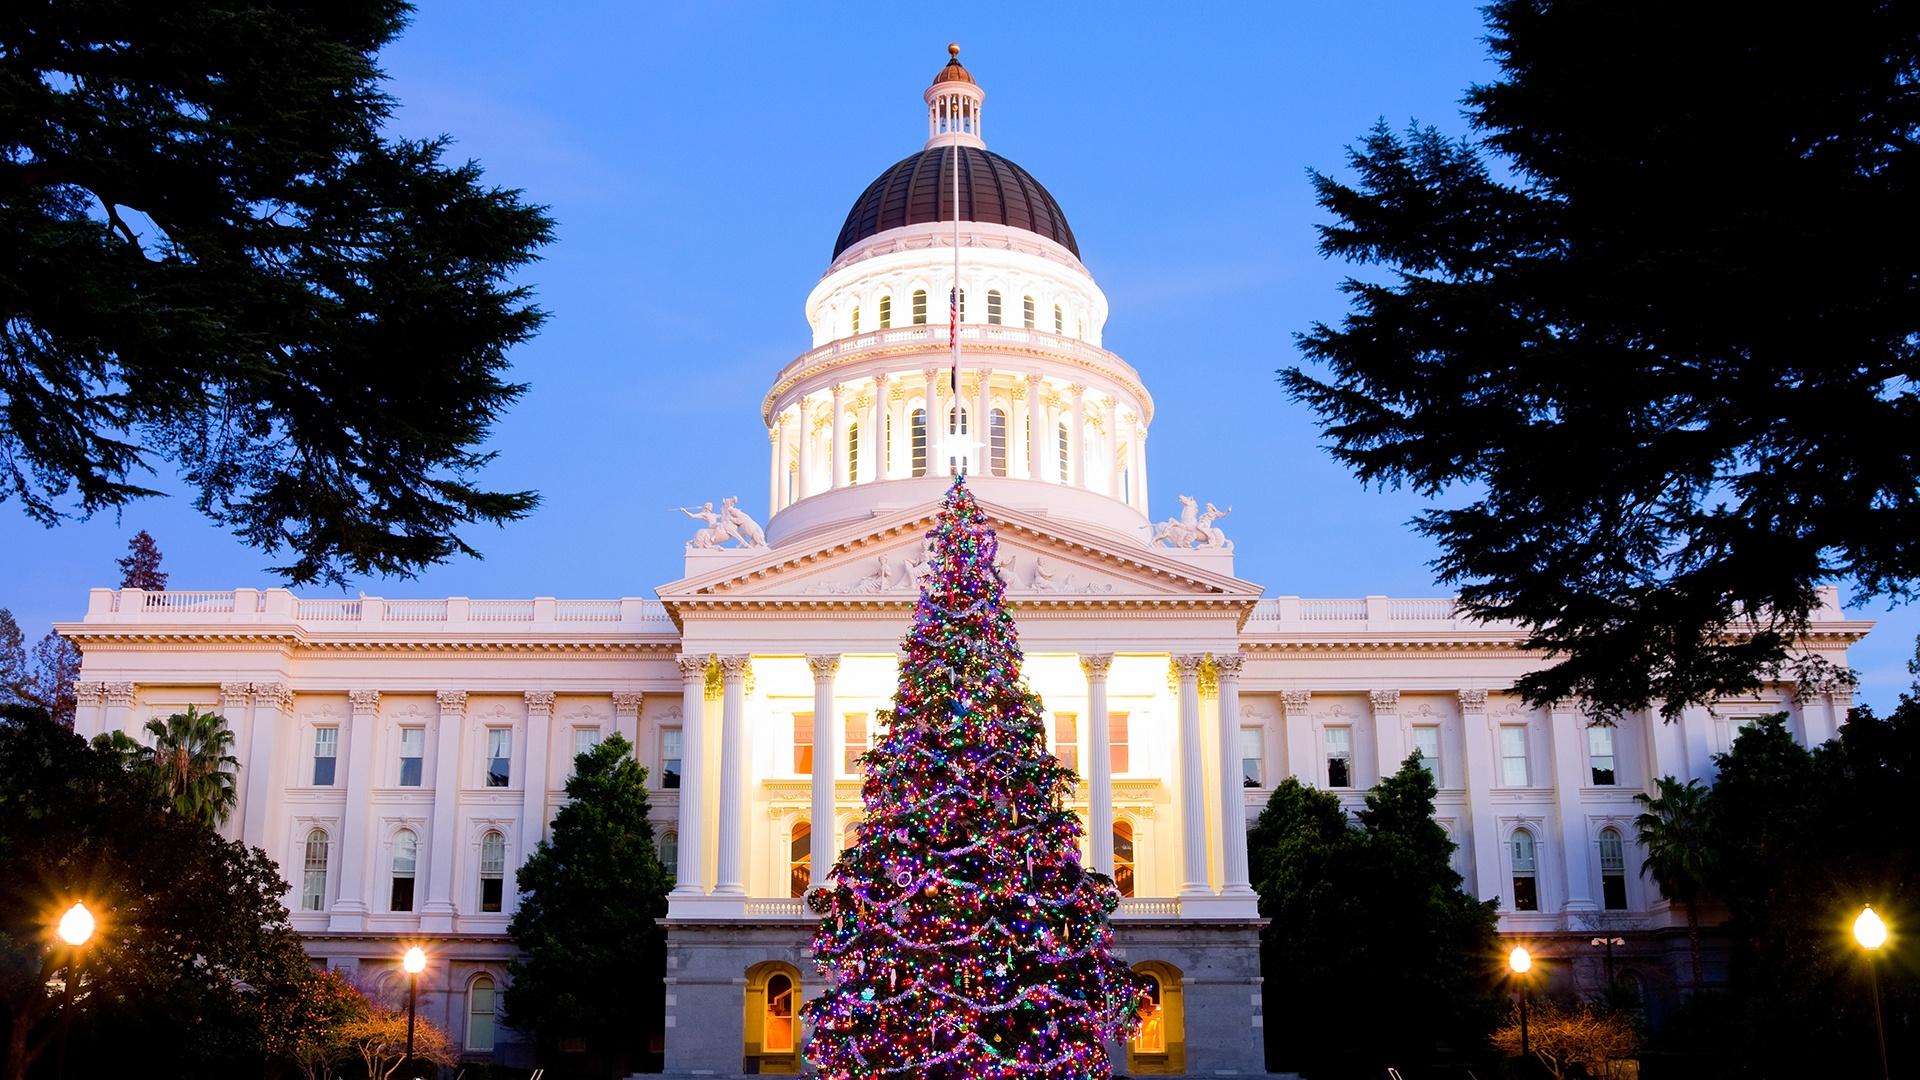 Make it a magical holiday season